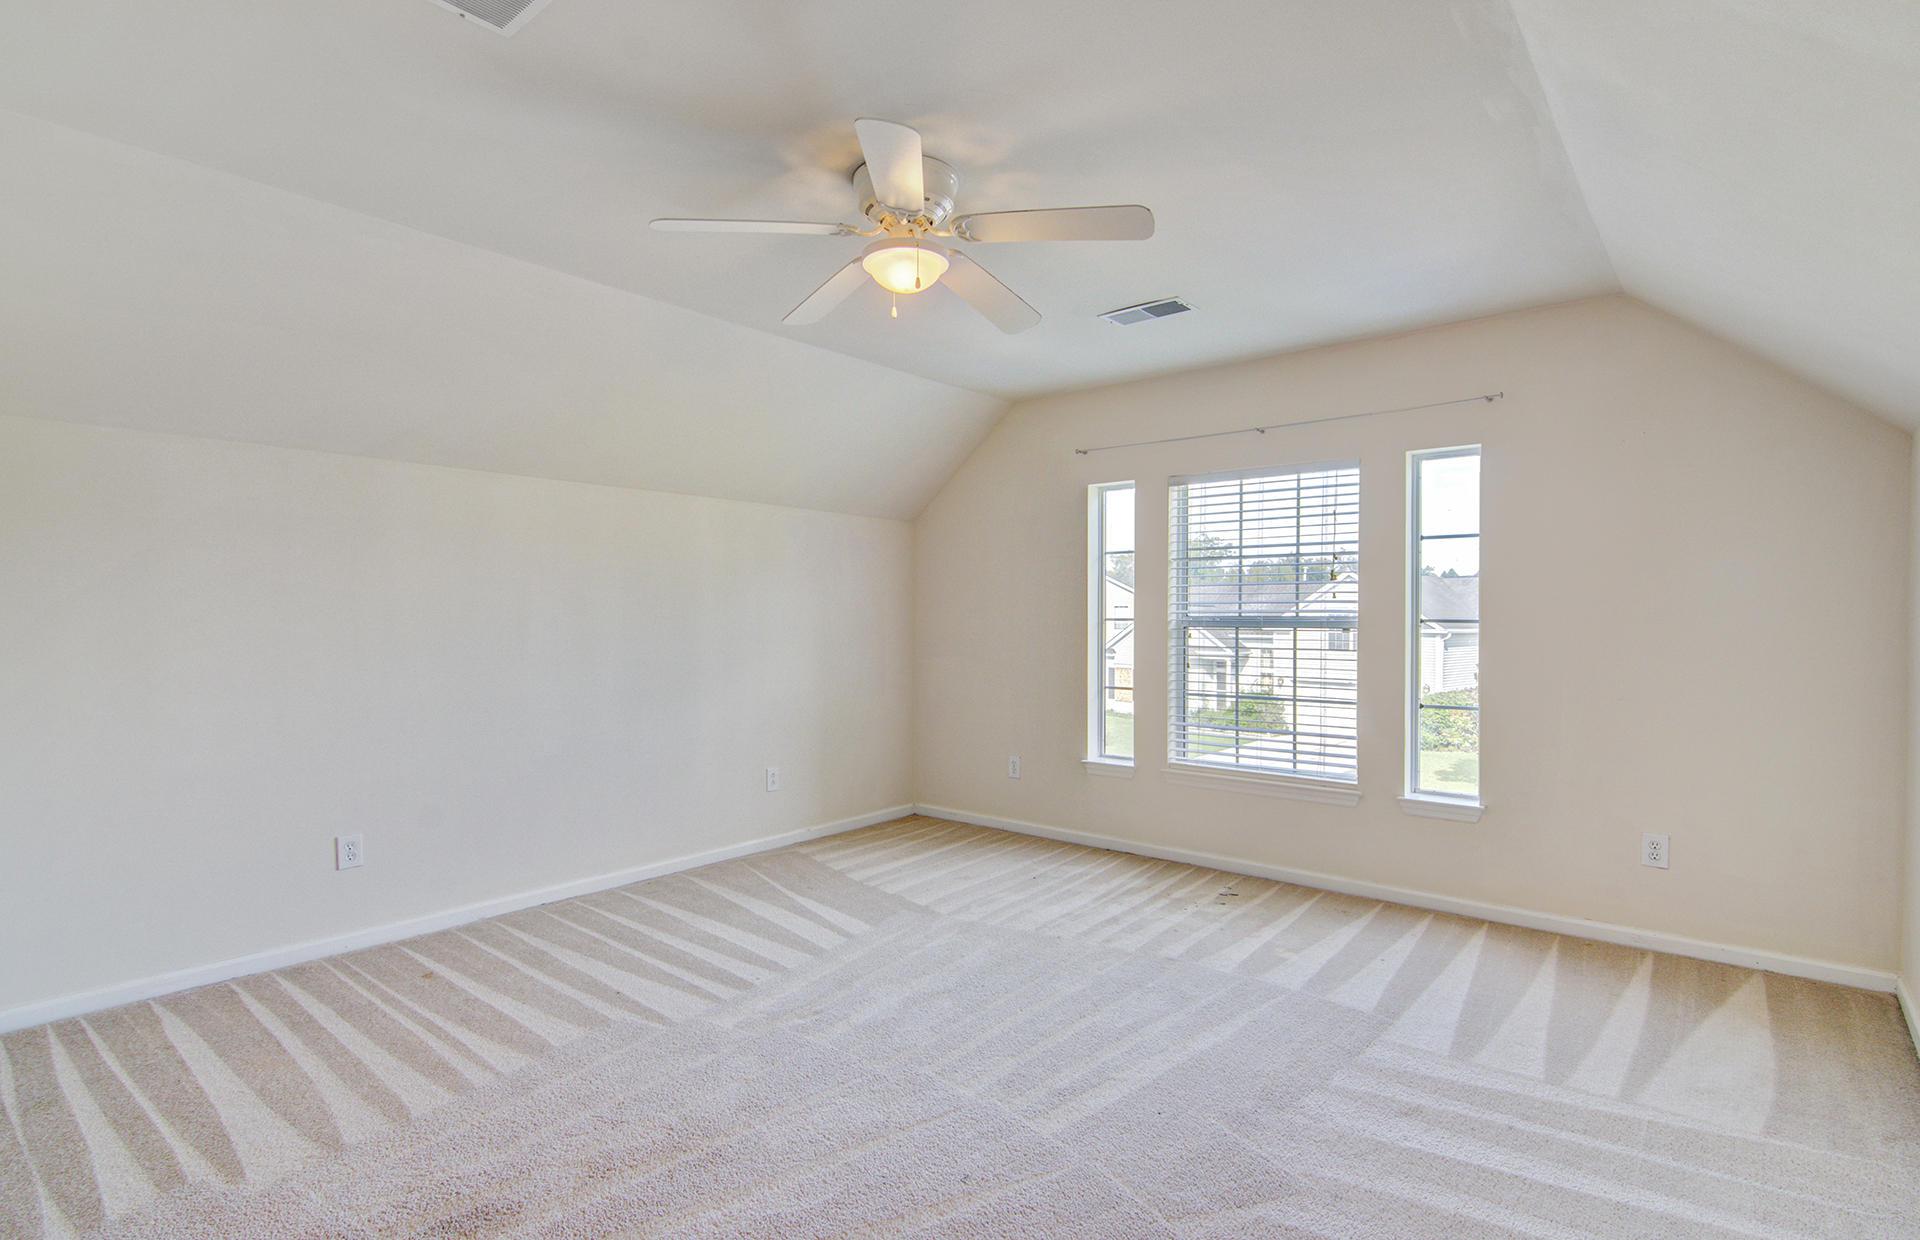 Grand Oaks Plantation Homes For Sale - 1013 Tyron, Charleston, SC - 7